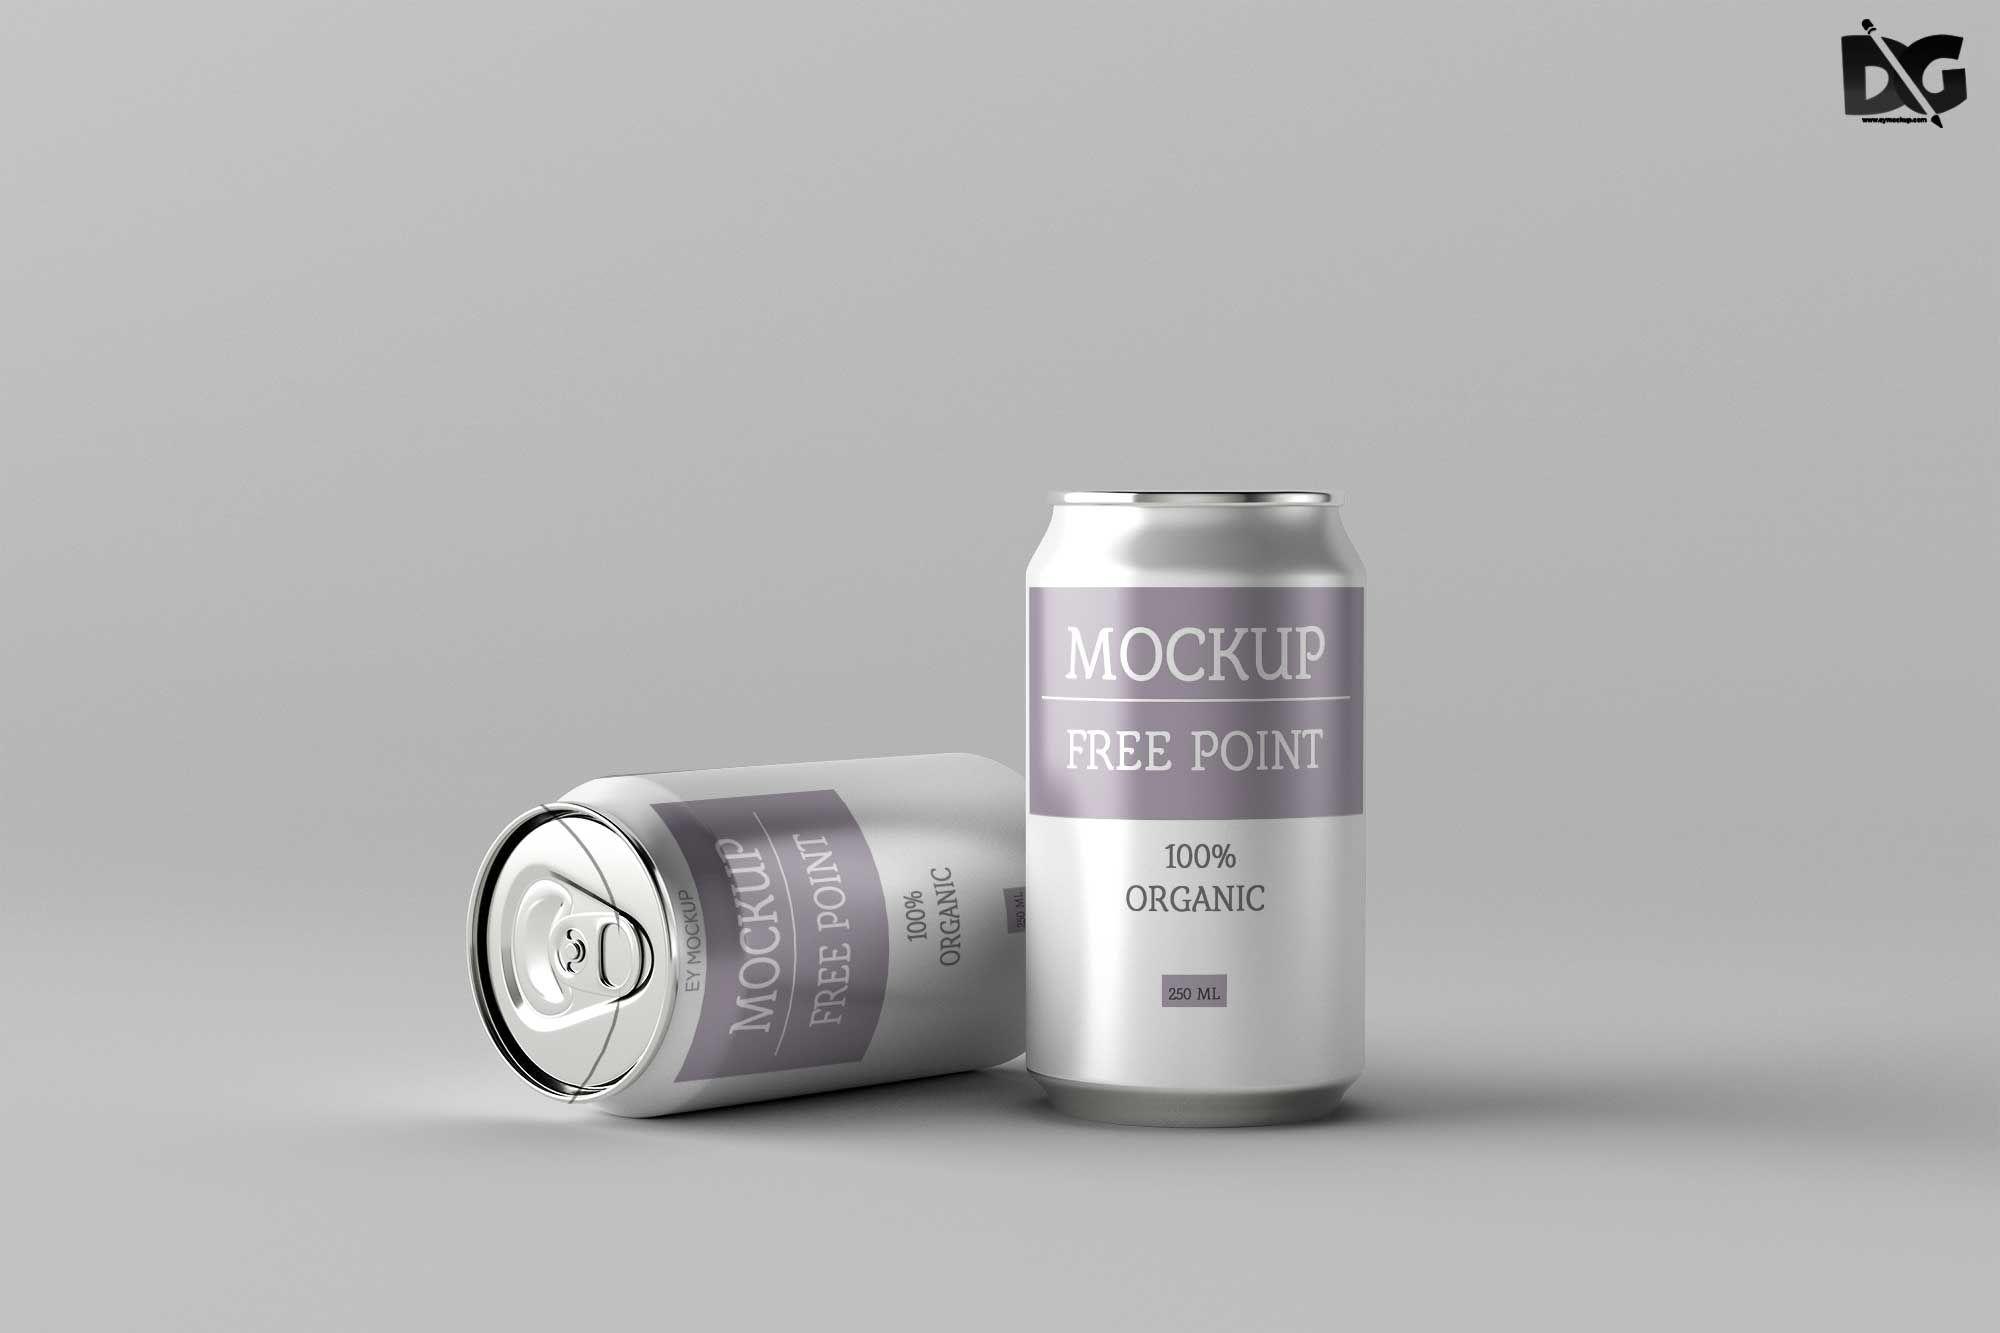 Free Beer Can Label Packaging Mockup Free Packaging Mockup Packaging Mockup Free Beer